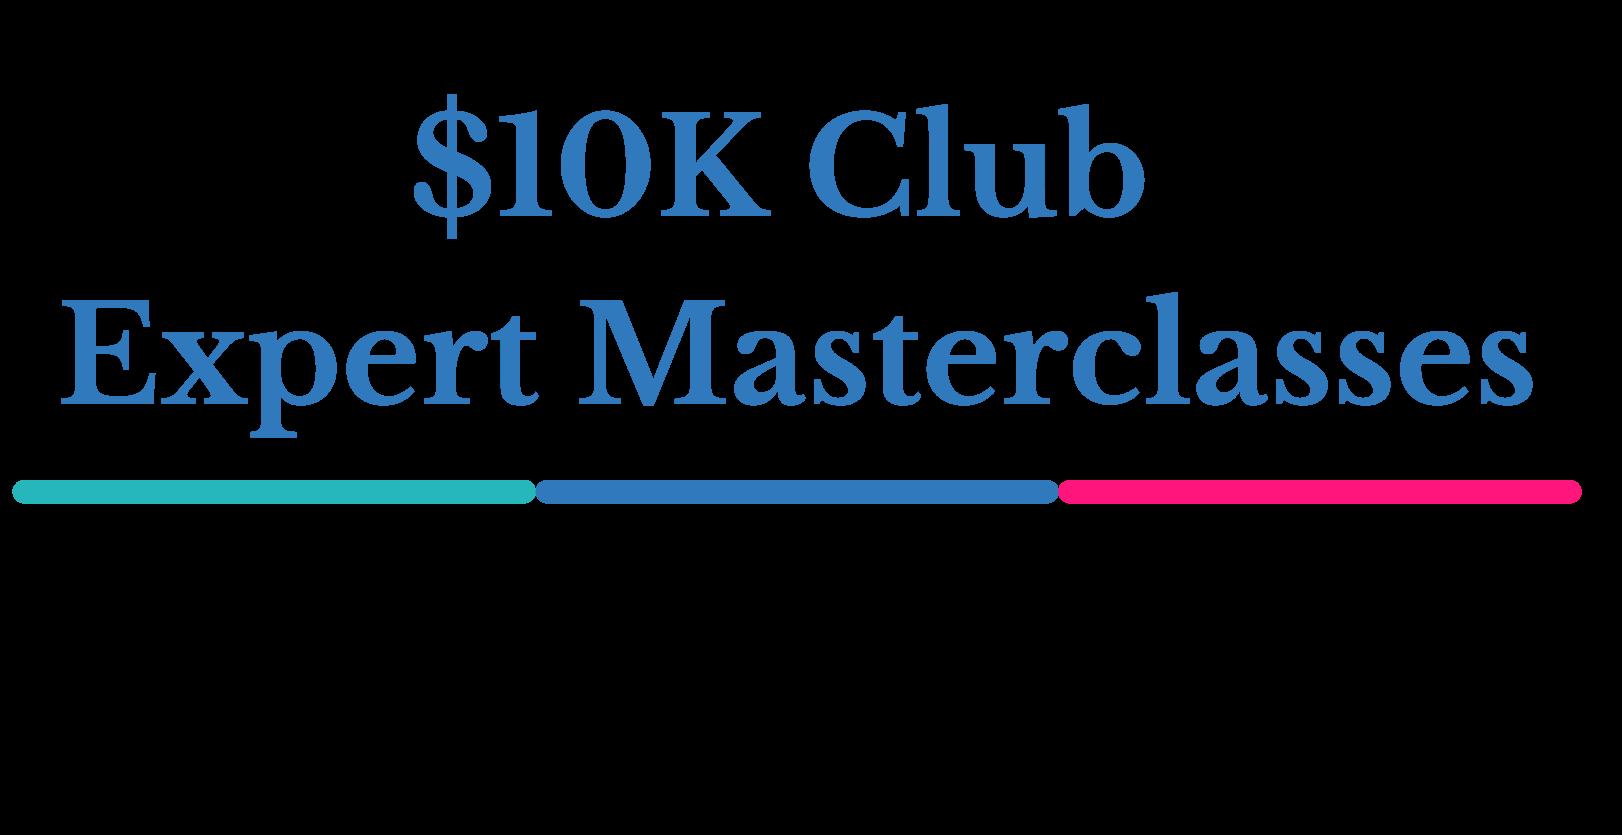 $10K Club Expert masterclassess Mock Up